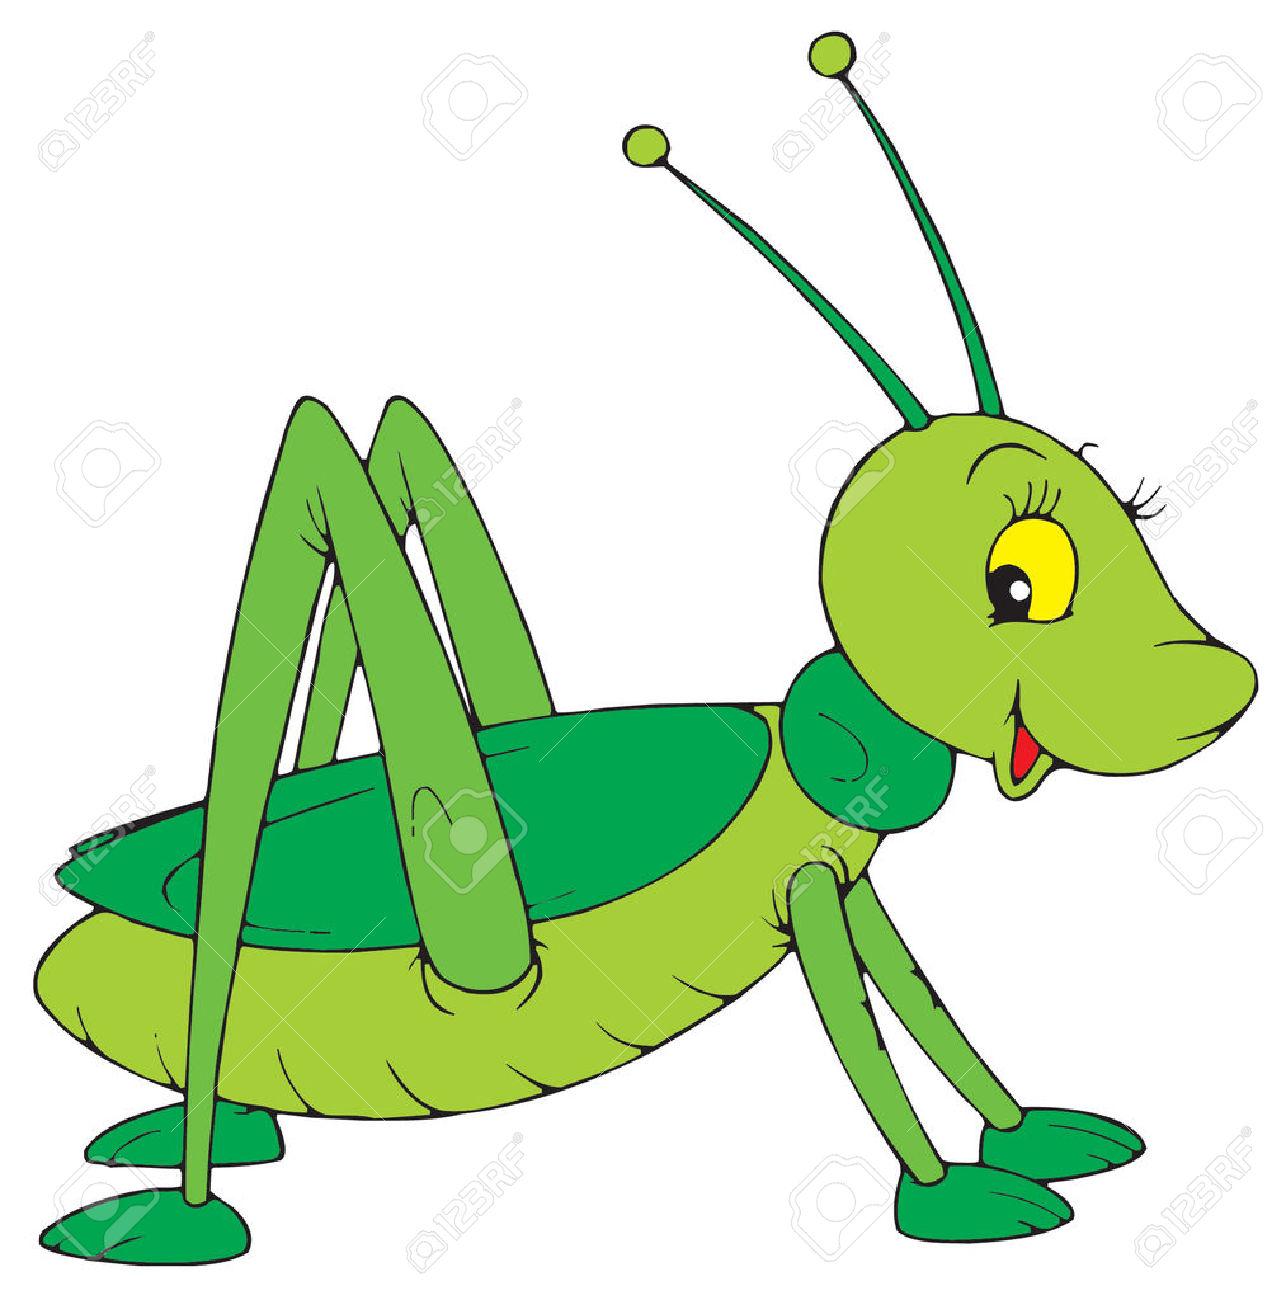 1286x1300 Grasshopper Clipart Cartoon